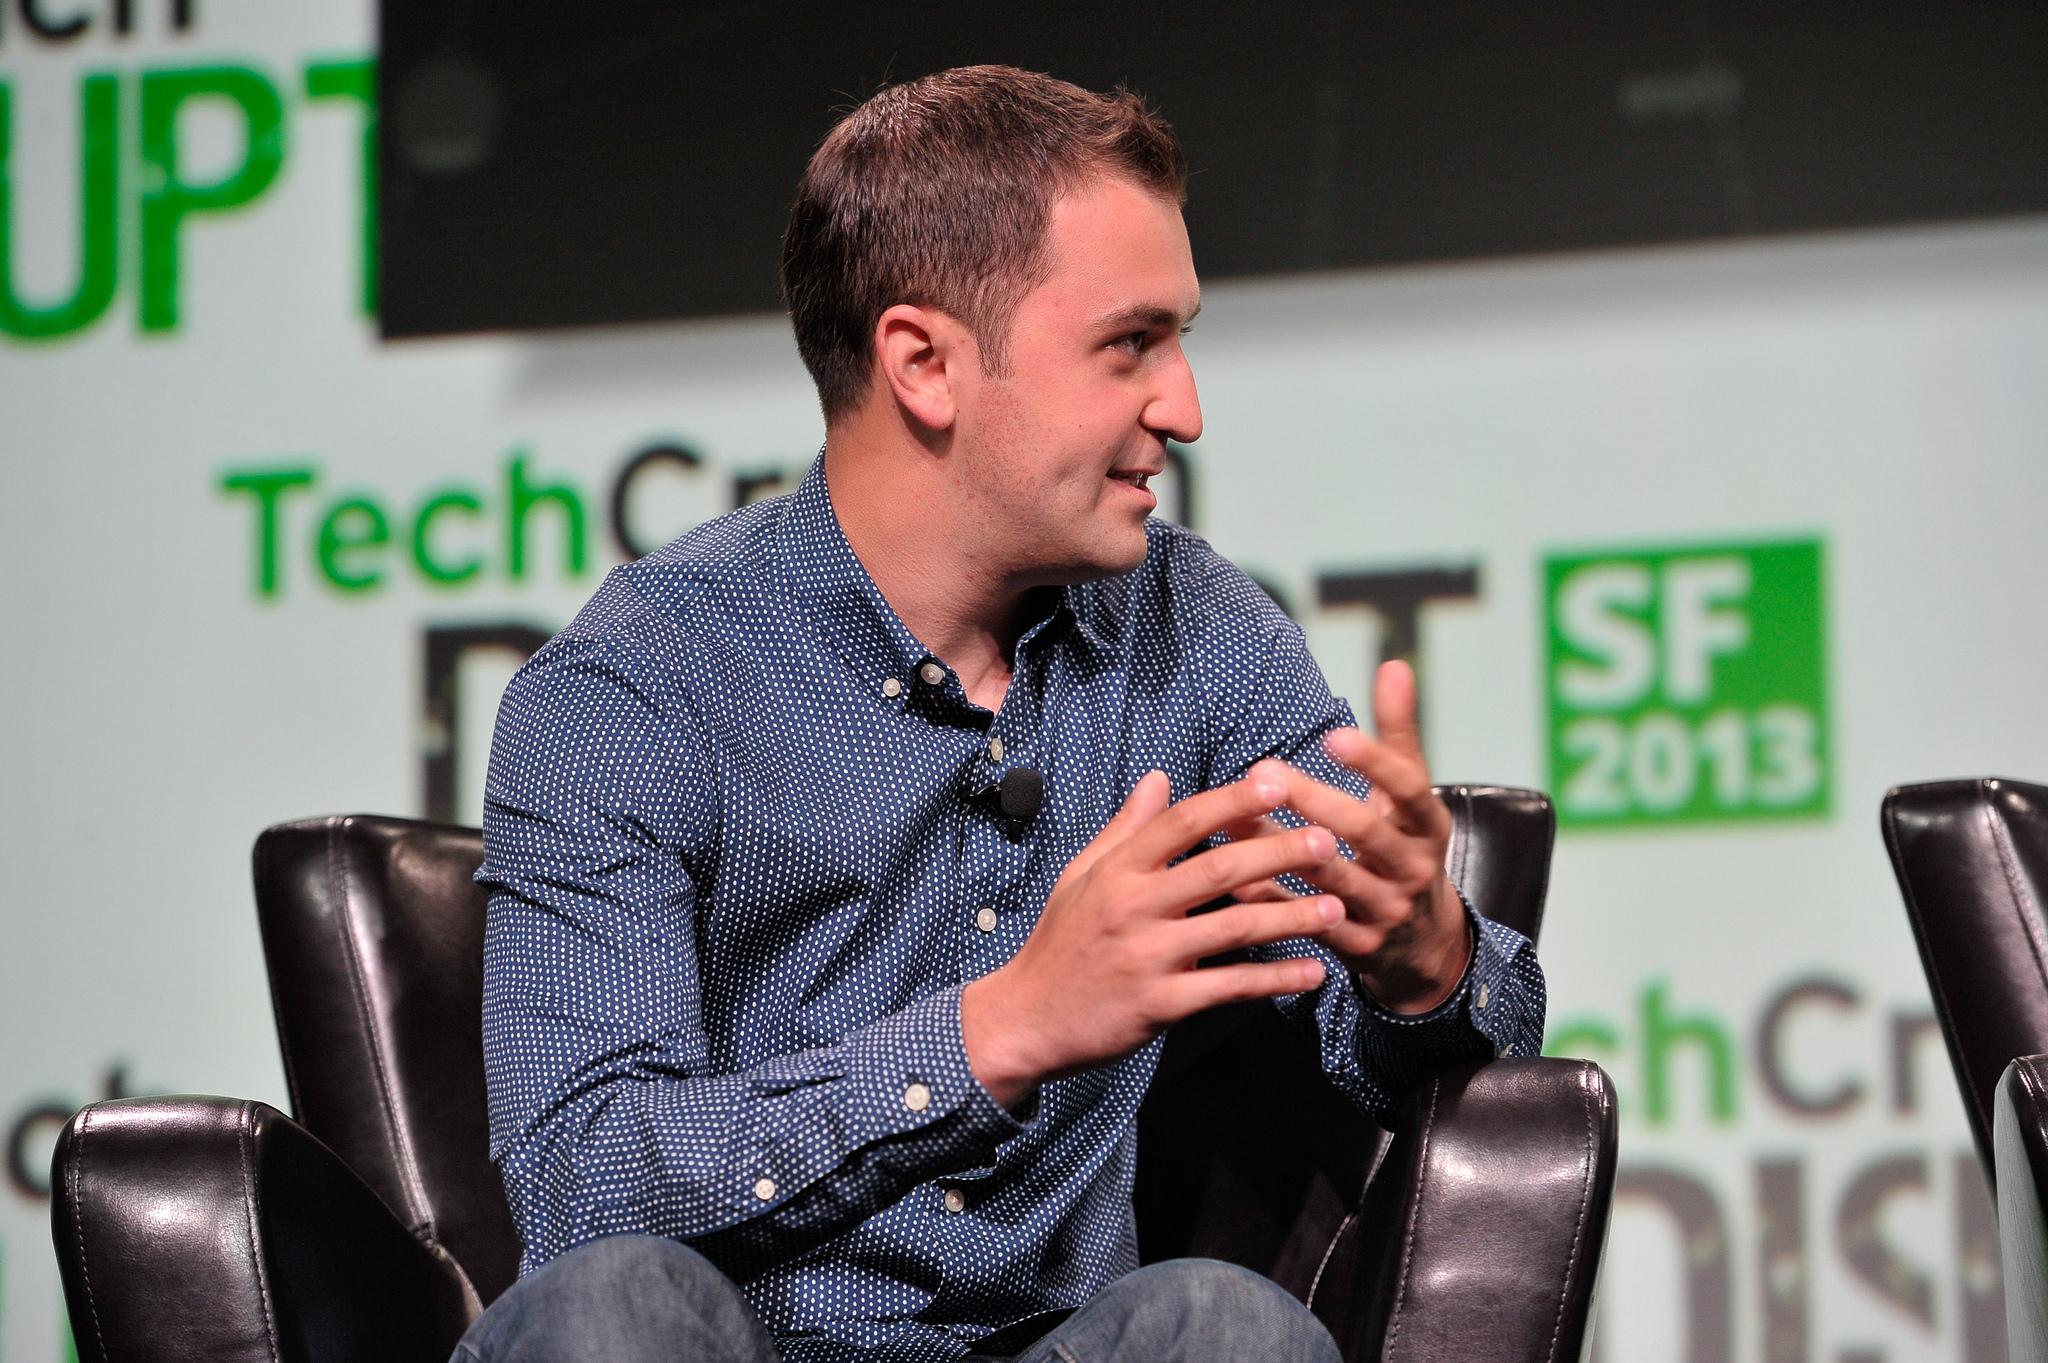 Lyft co-founder John Zimmer at TechCrunch Disrupt SF 2013.